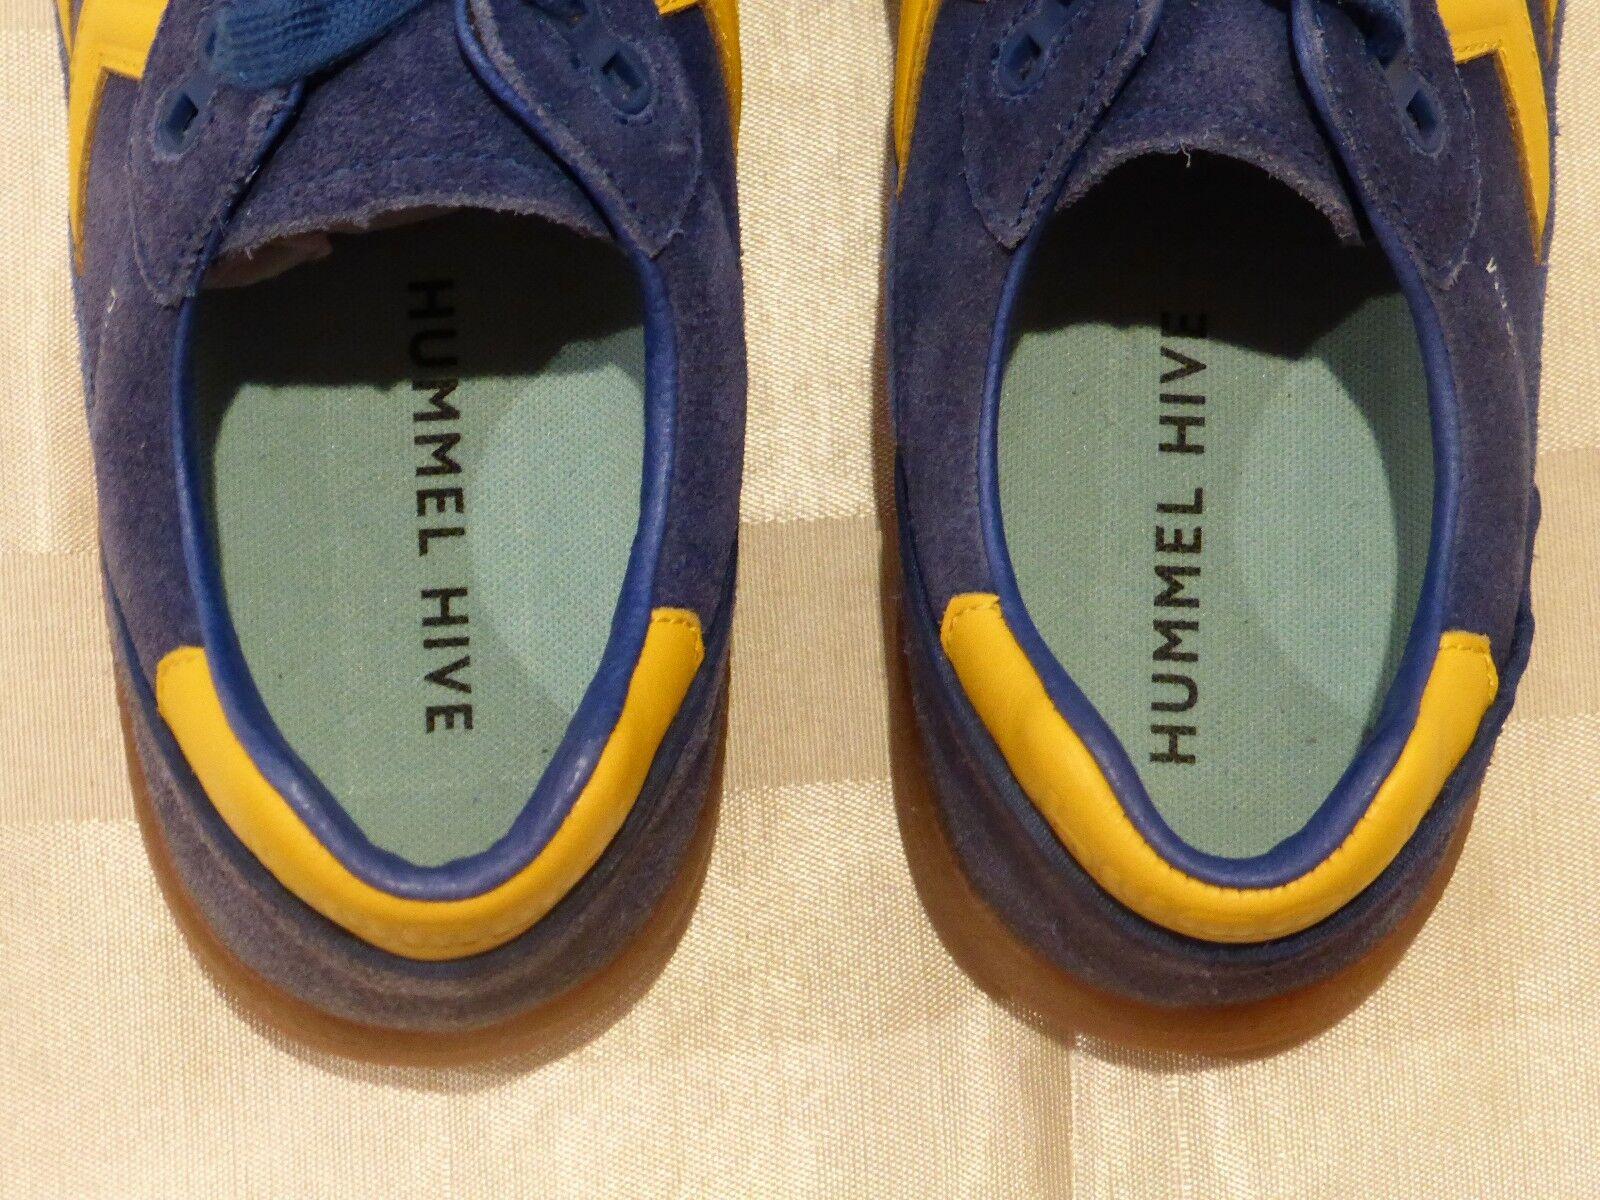 Hummel DHB Team OG History 'Limoges Blue' Sample (US 8.5)New air ultra max retro Scarpe classiche da uomo